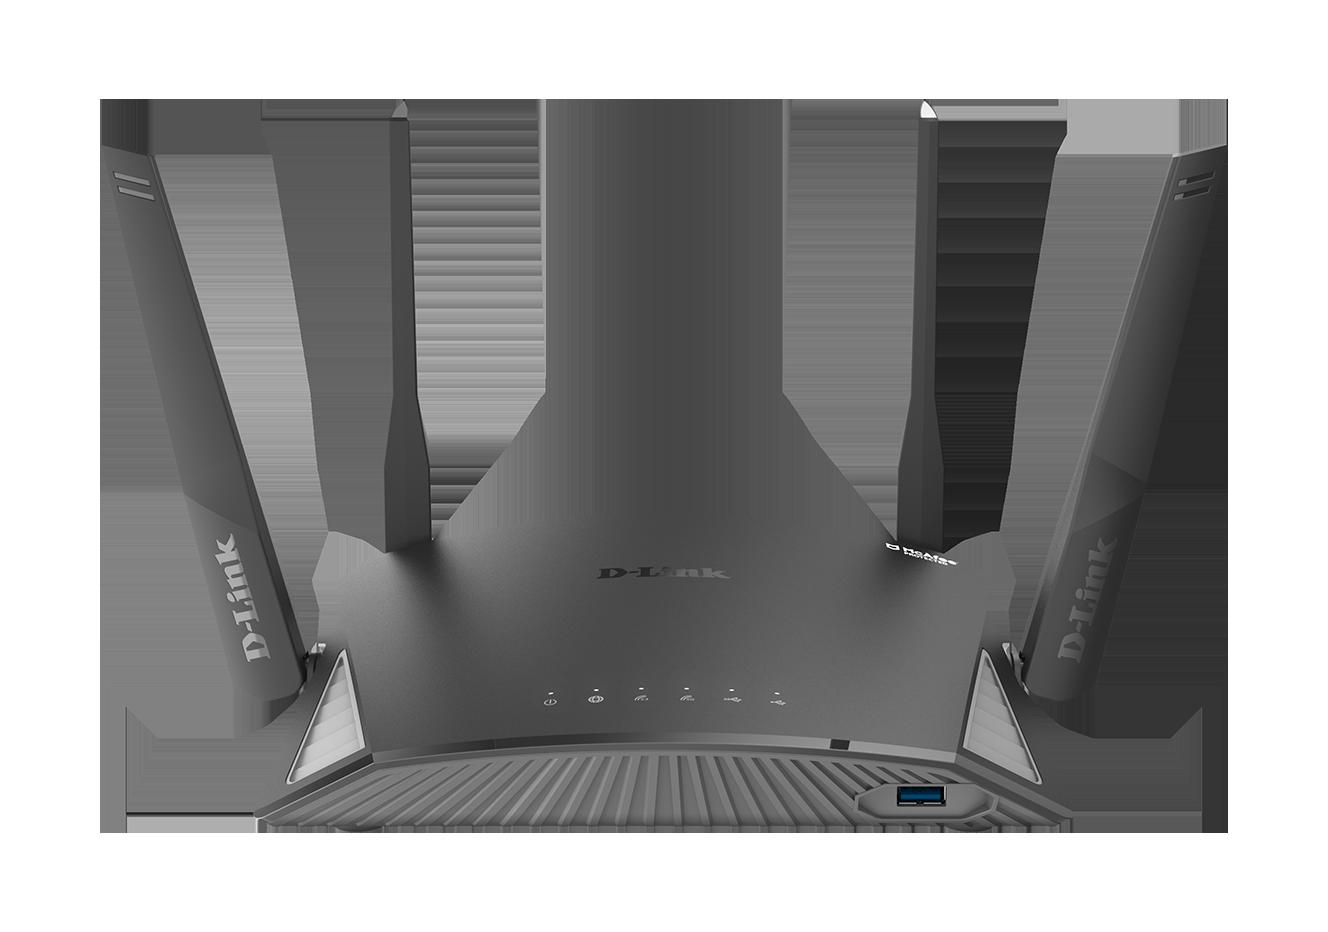 DIR-2660 EXO AC2600 Smart Mesh Wi-Fi Router front